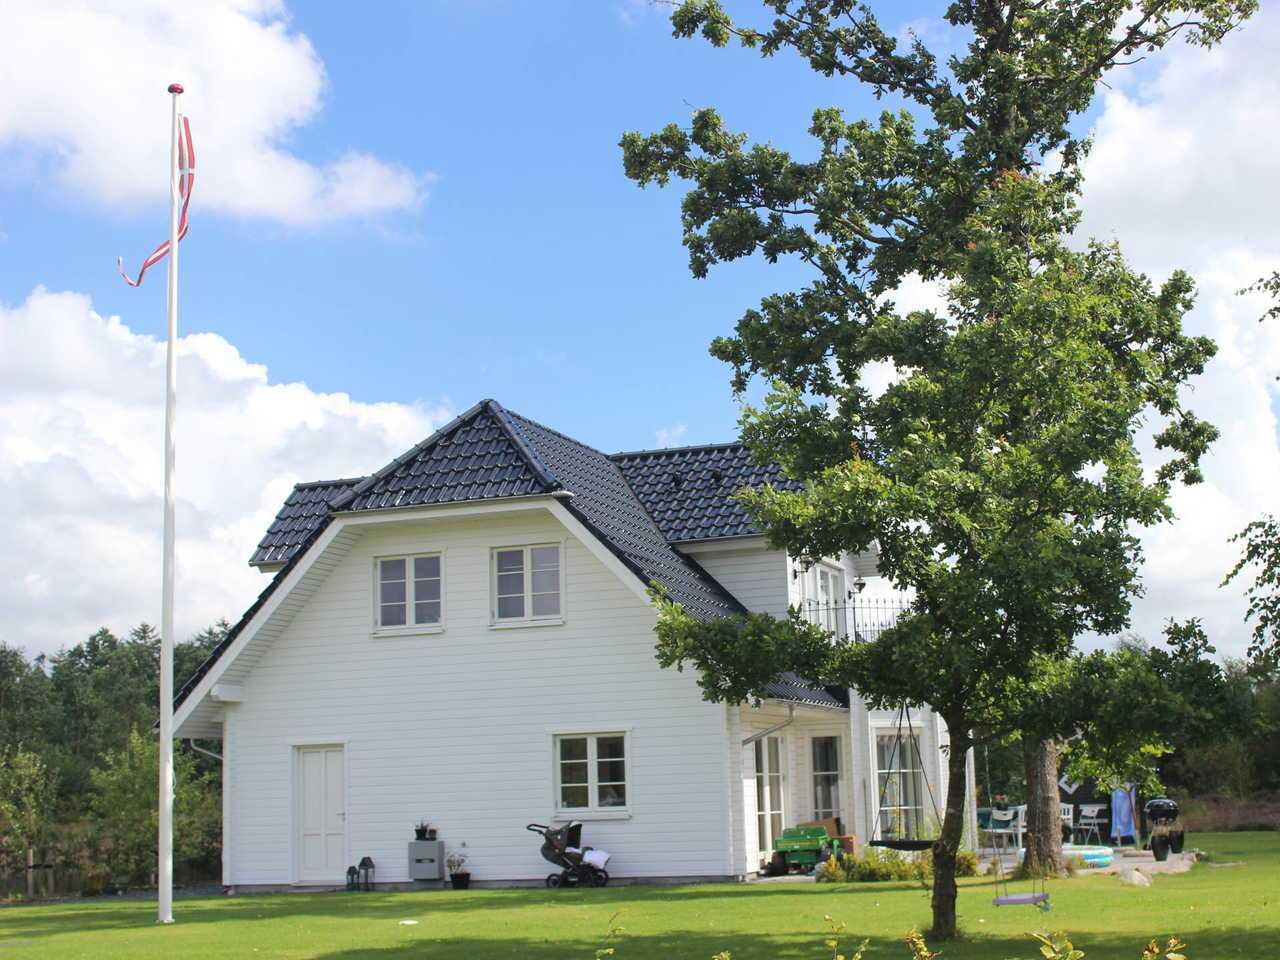 Helsingör Holzhaus Fjorborg Häuser Ansicht 2